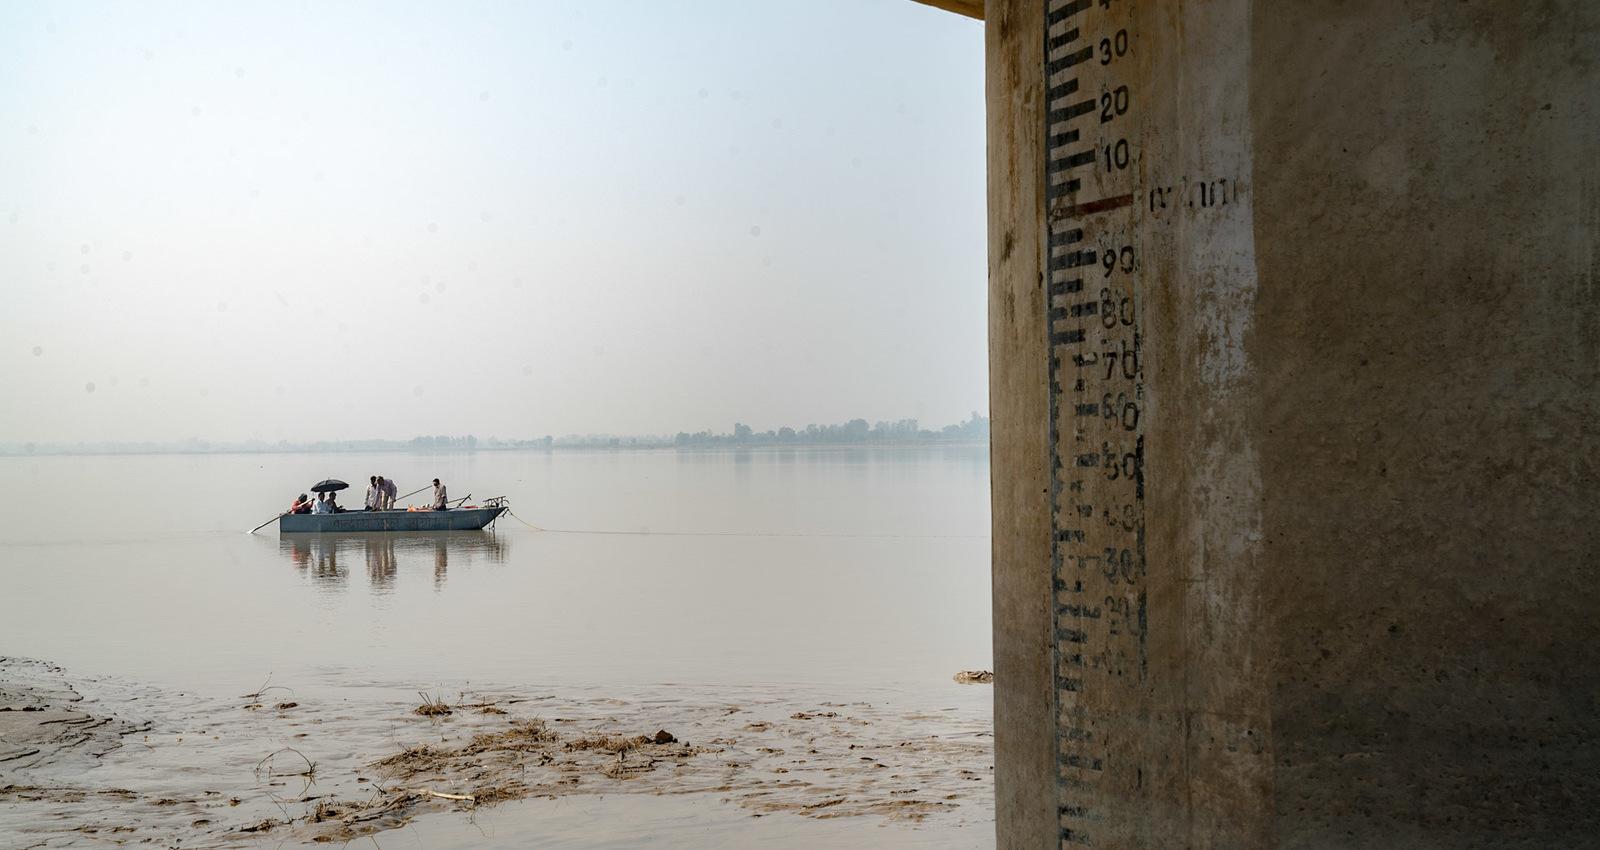 Inside Google: When Rivers Rise